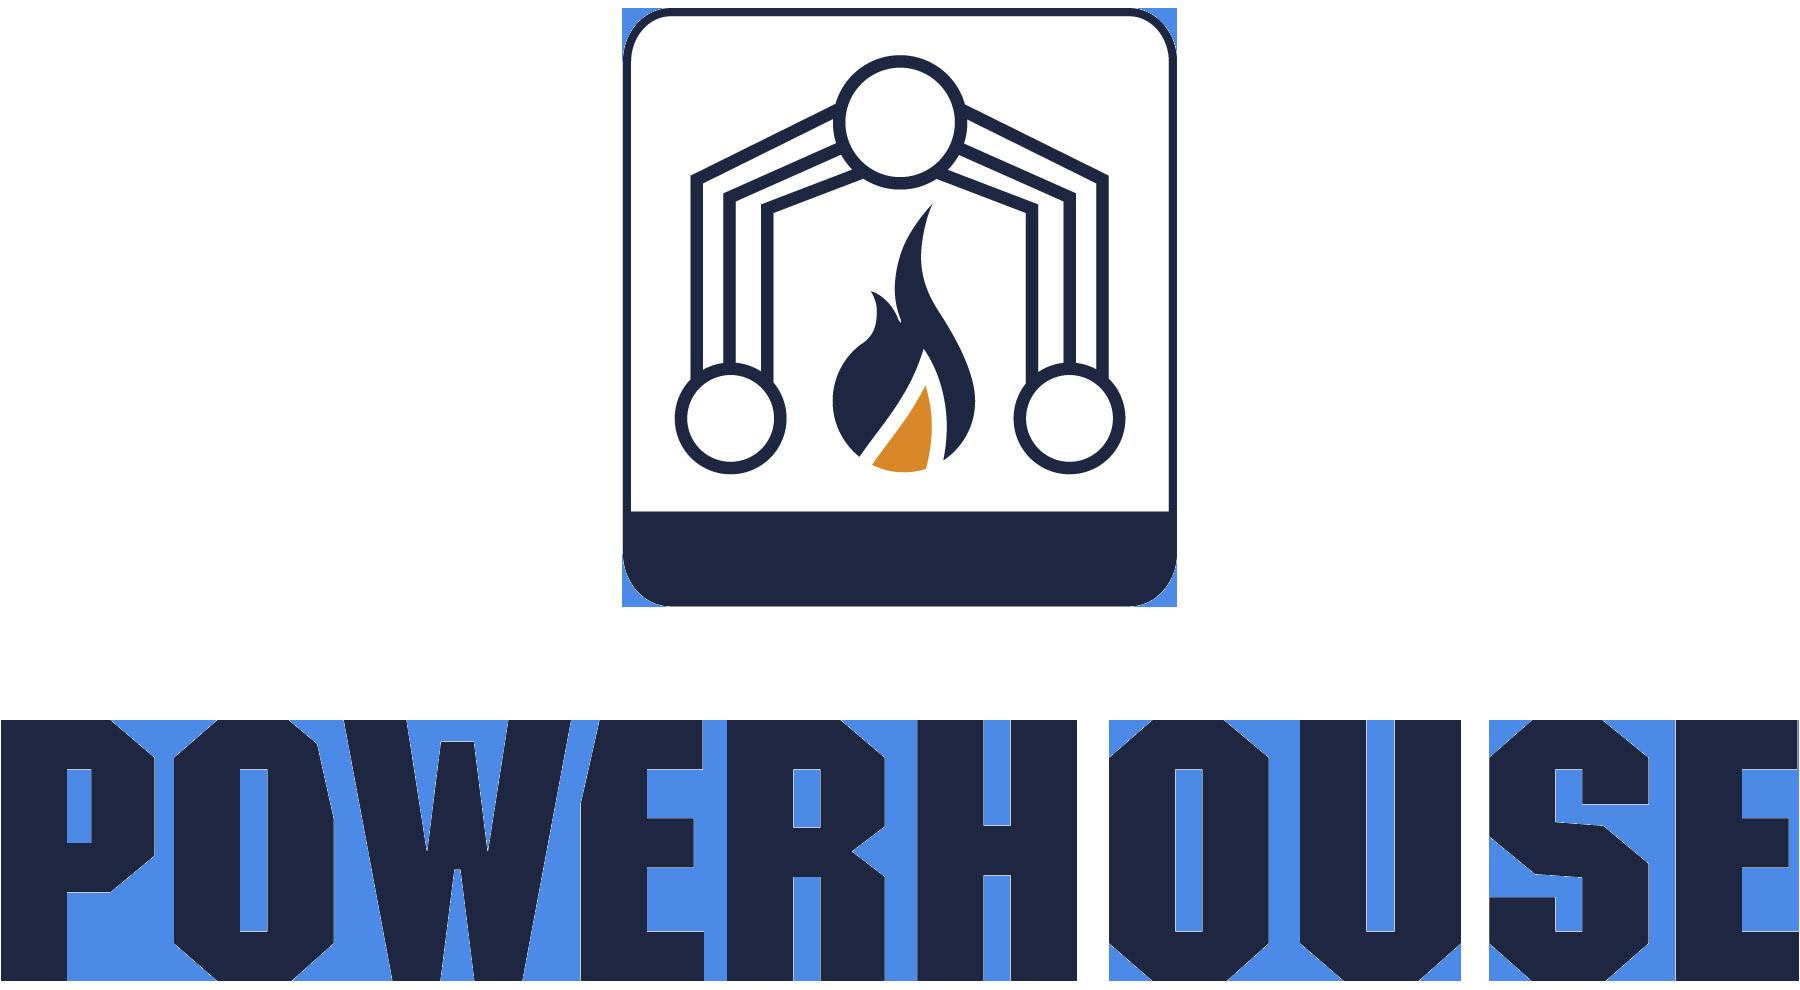 Powerhouse